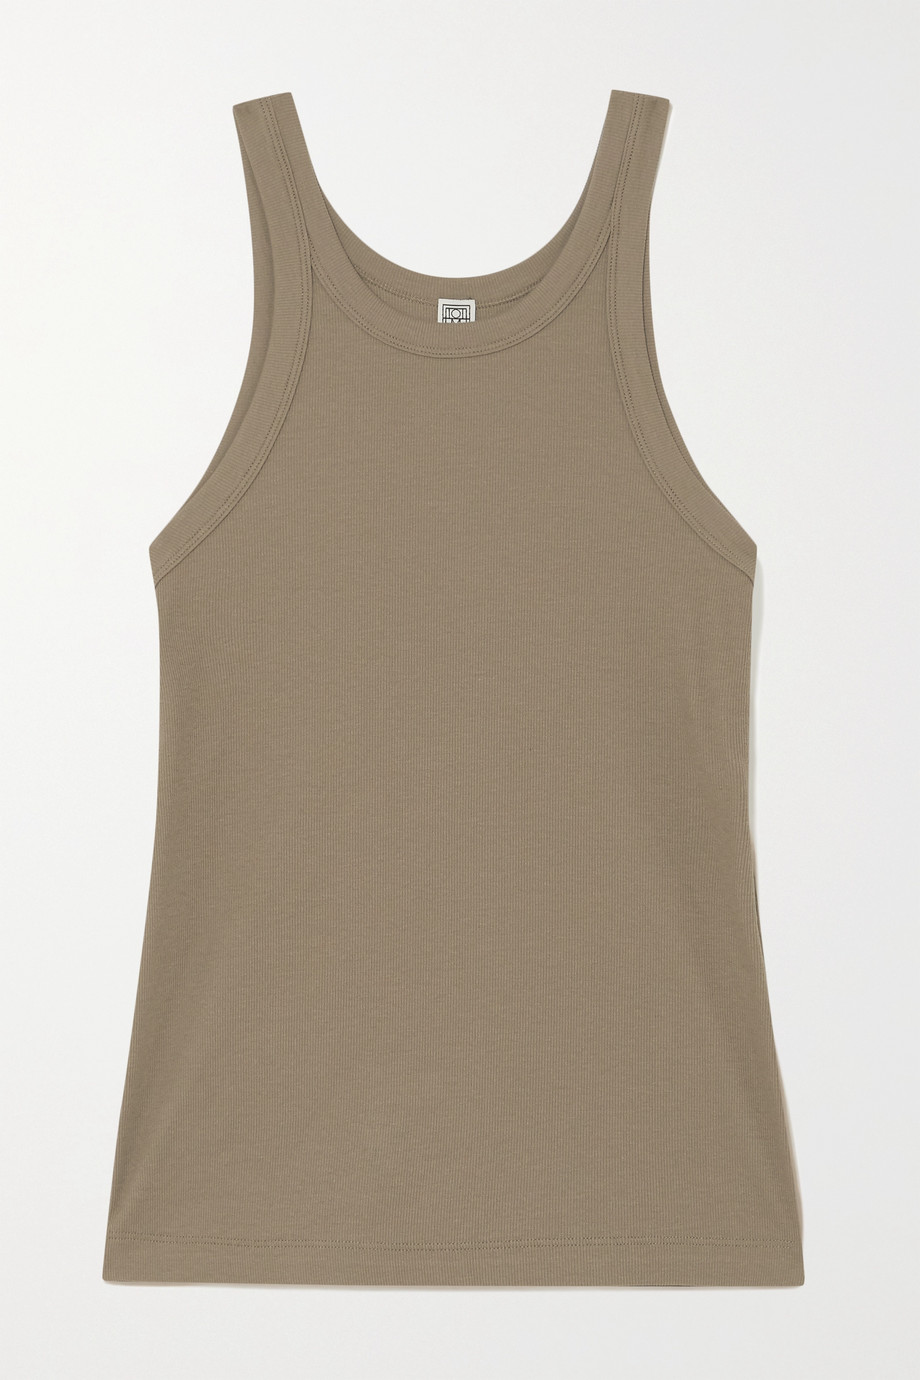 Totême Espera ribbed stretch-organic cotton jersey tank